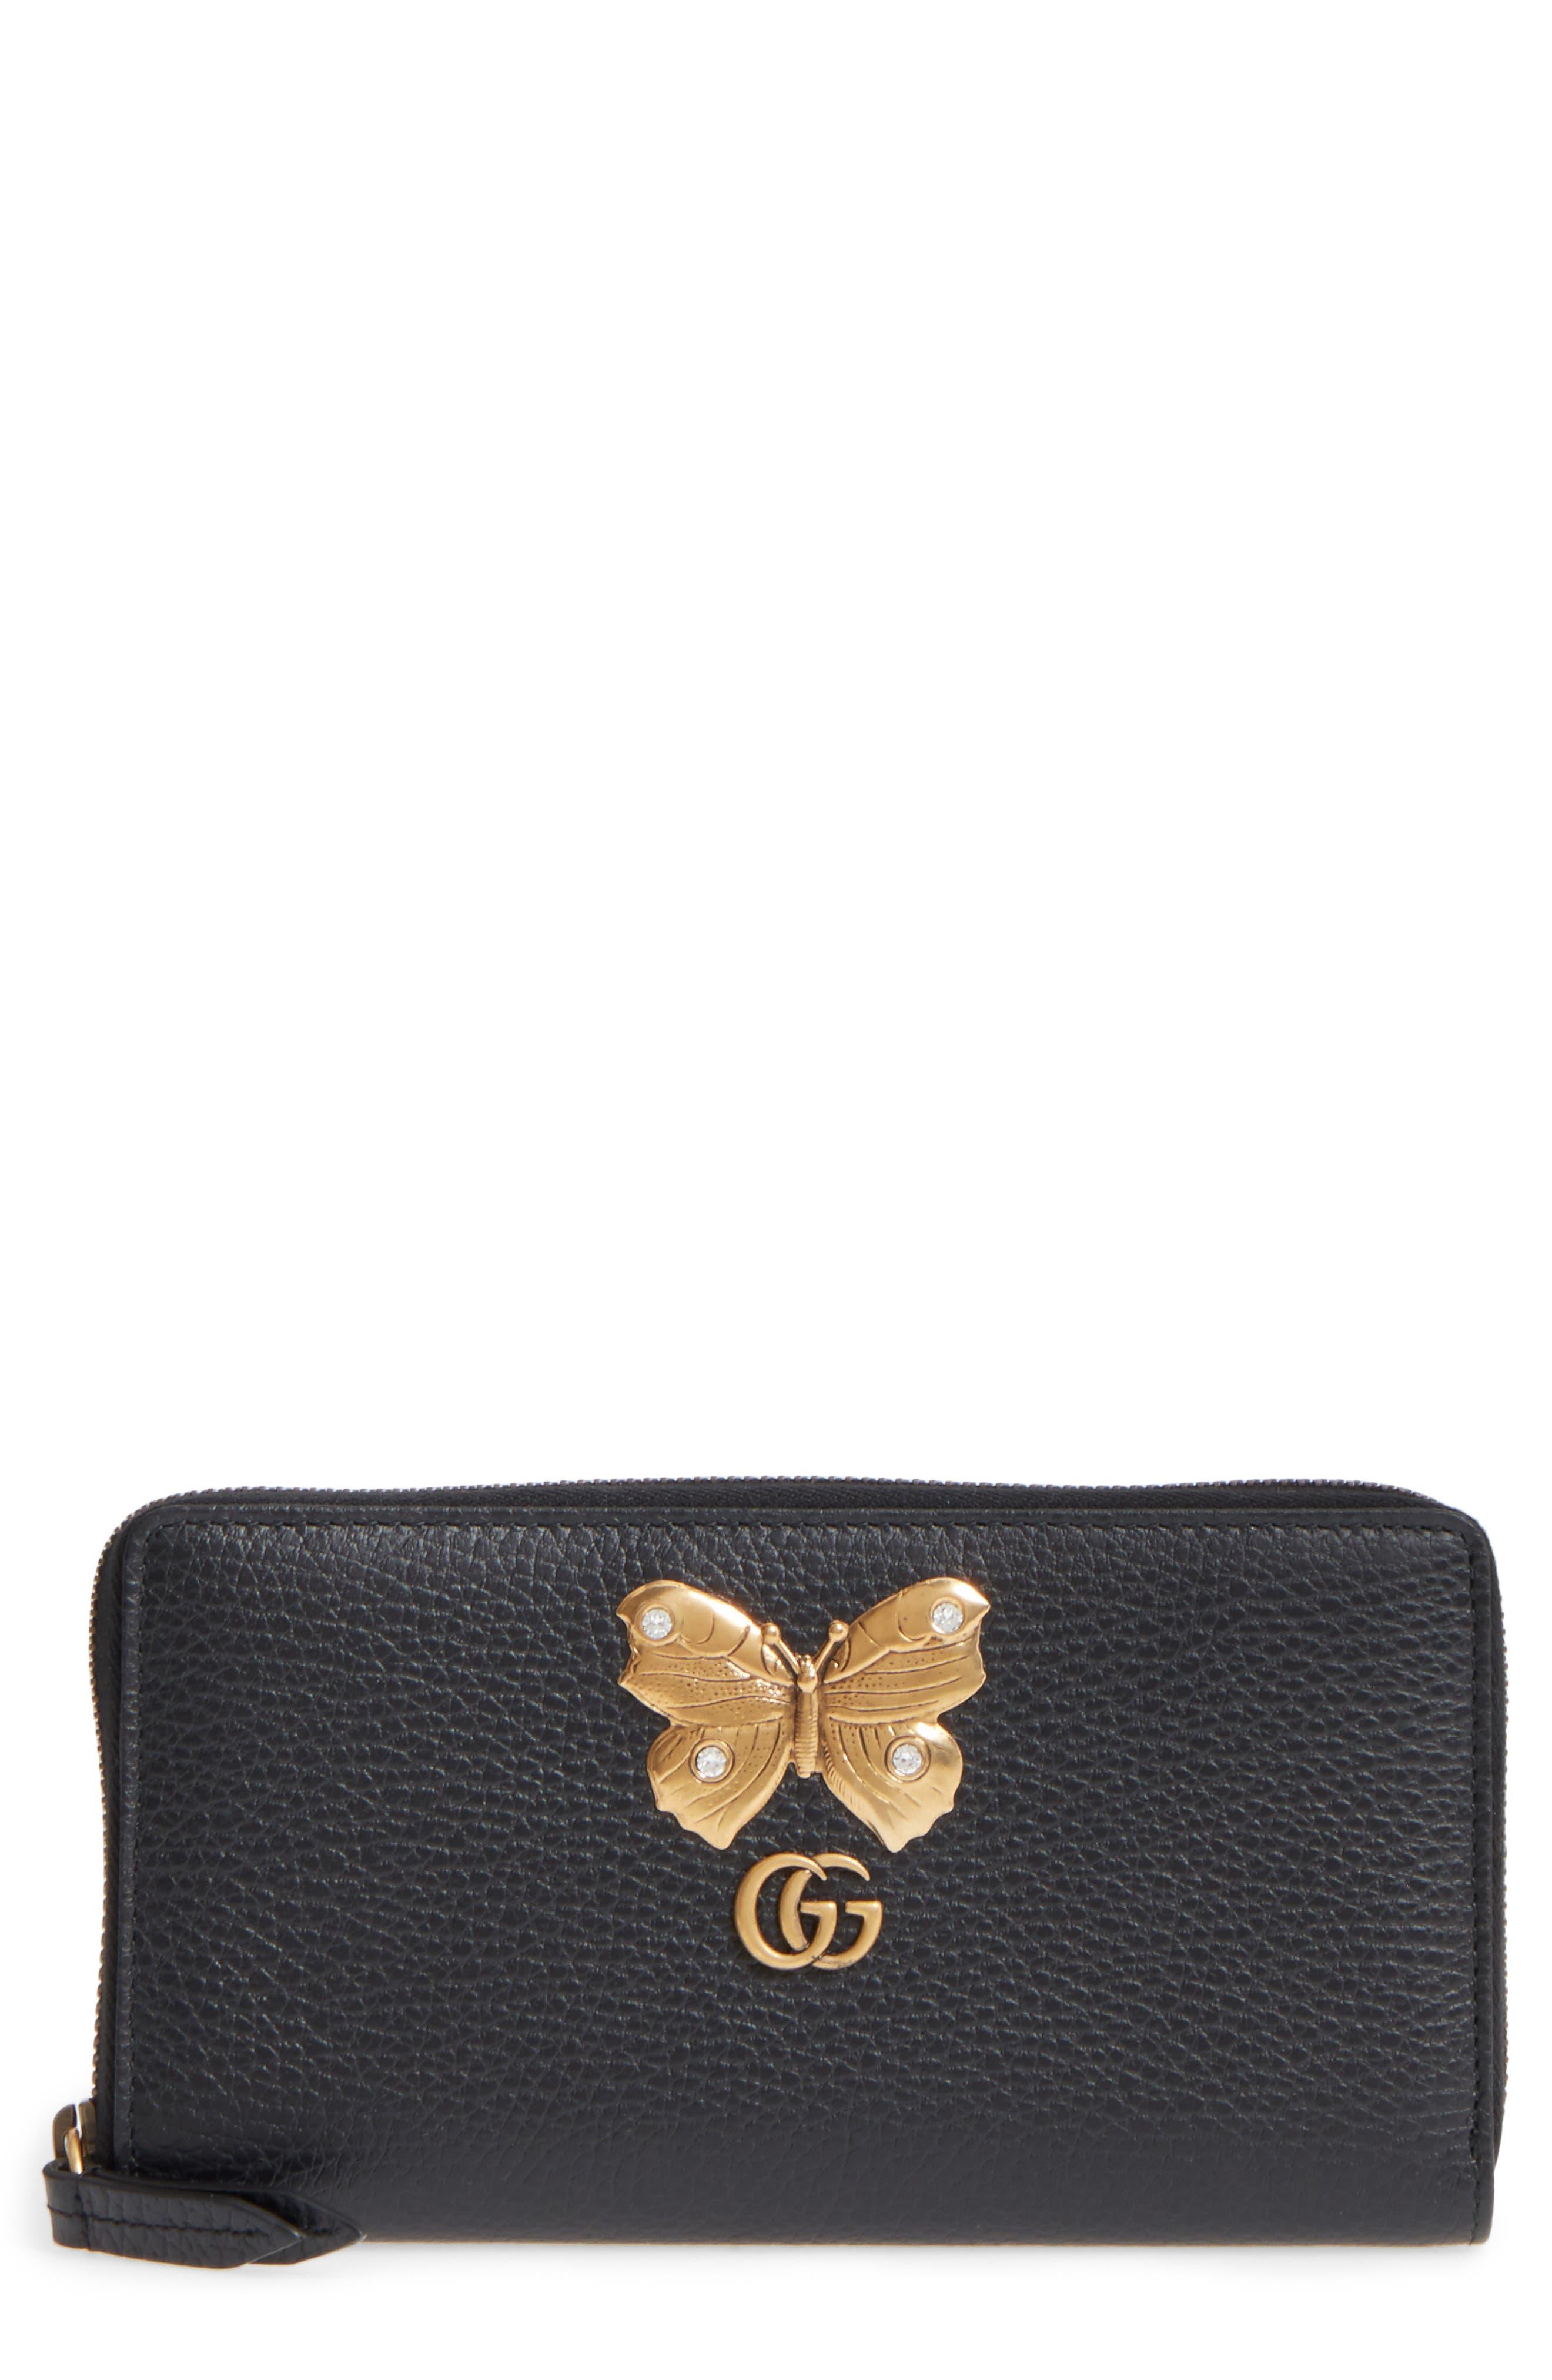 Farfalla Zip Around Leather Wallet,                             Main thumbnail 1, color,                             NERO/ CRYSTAL